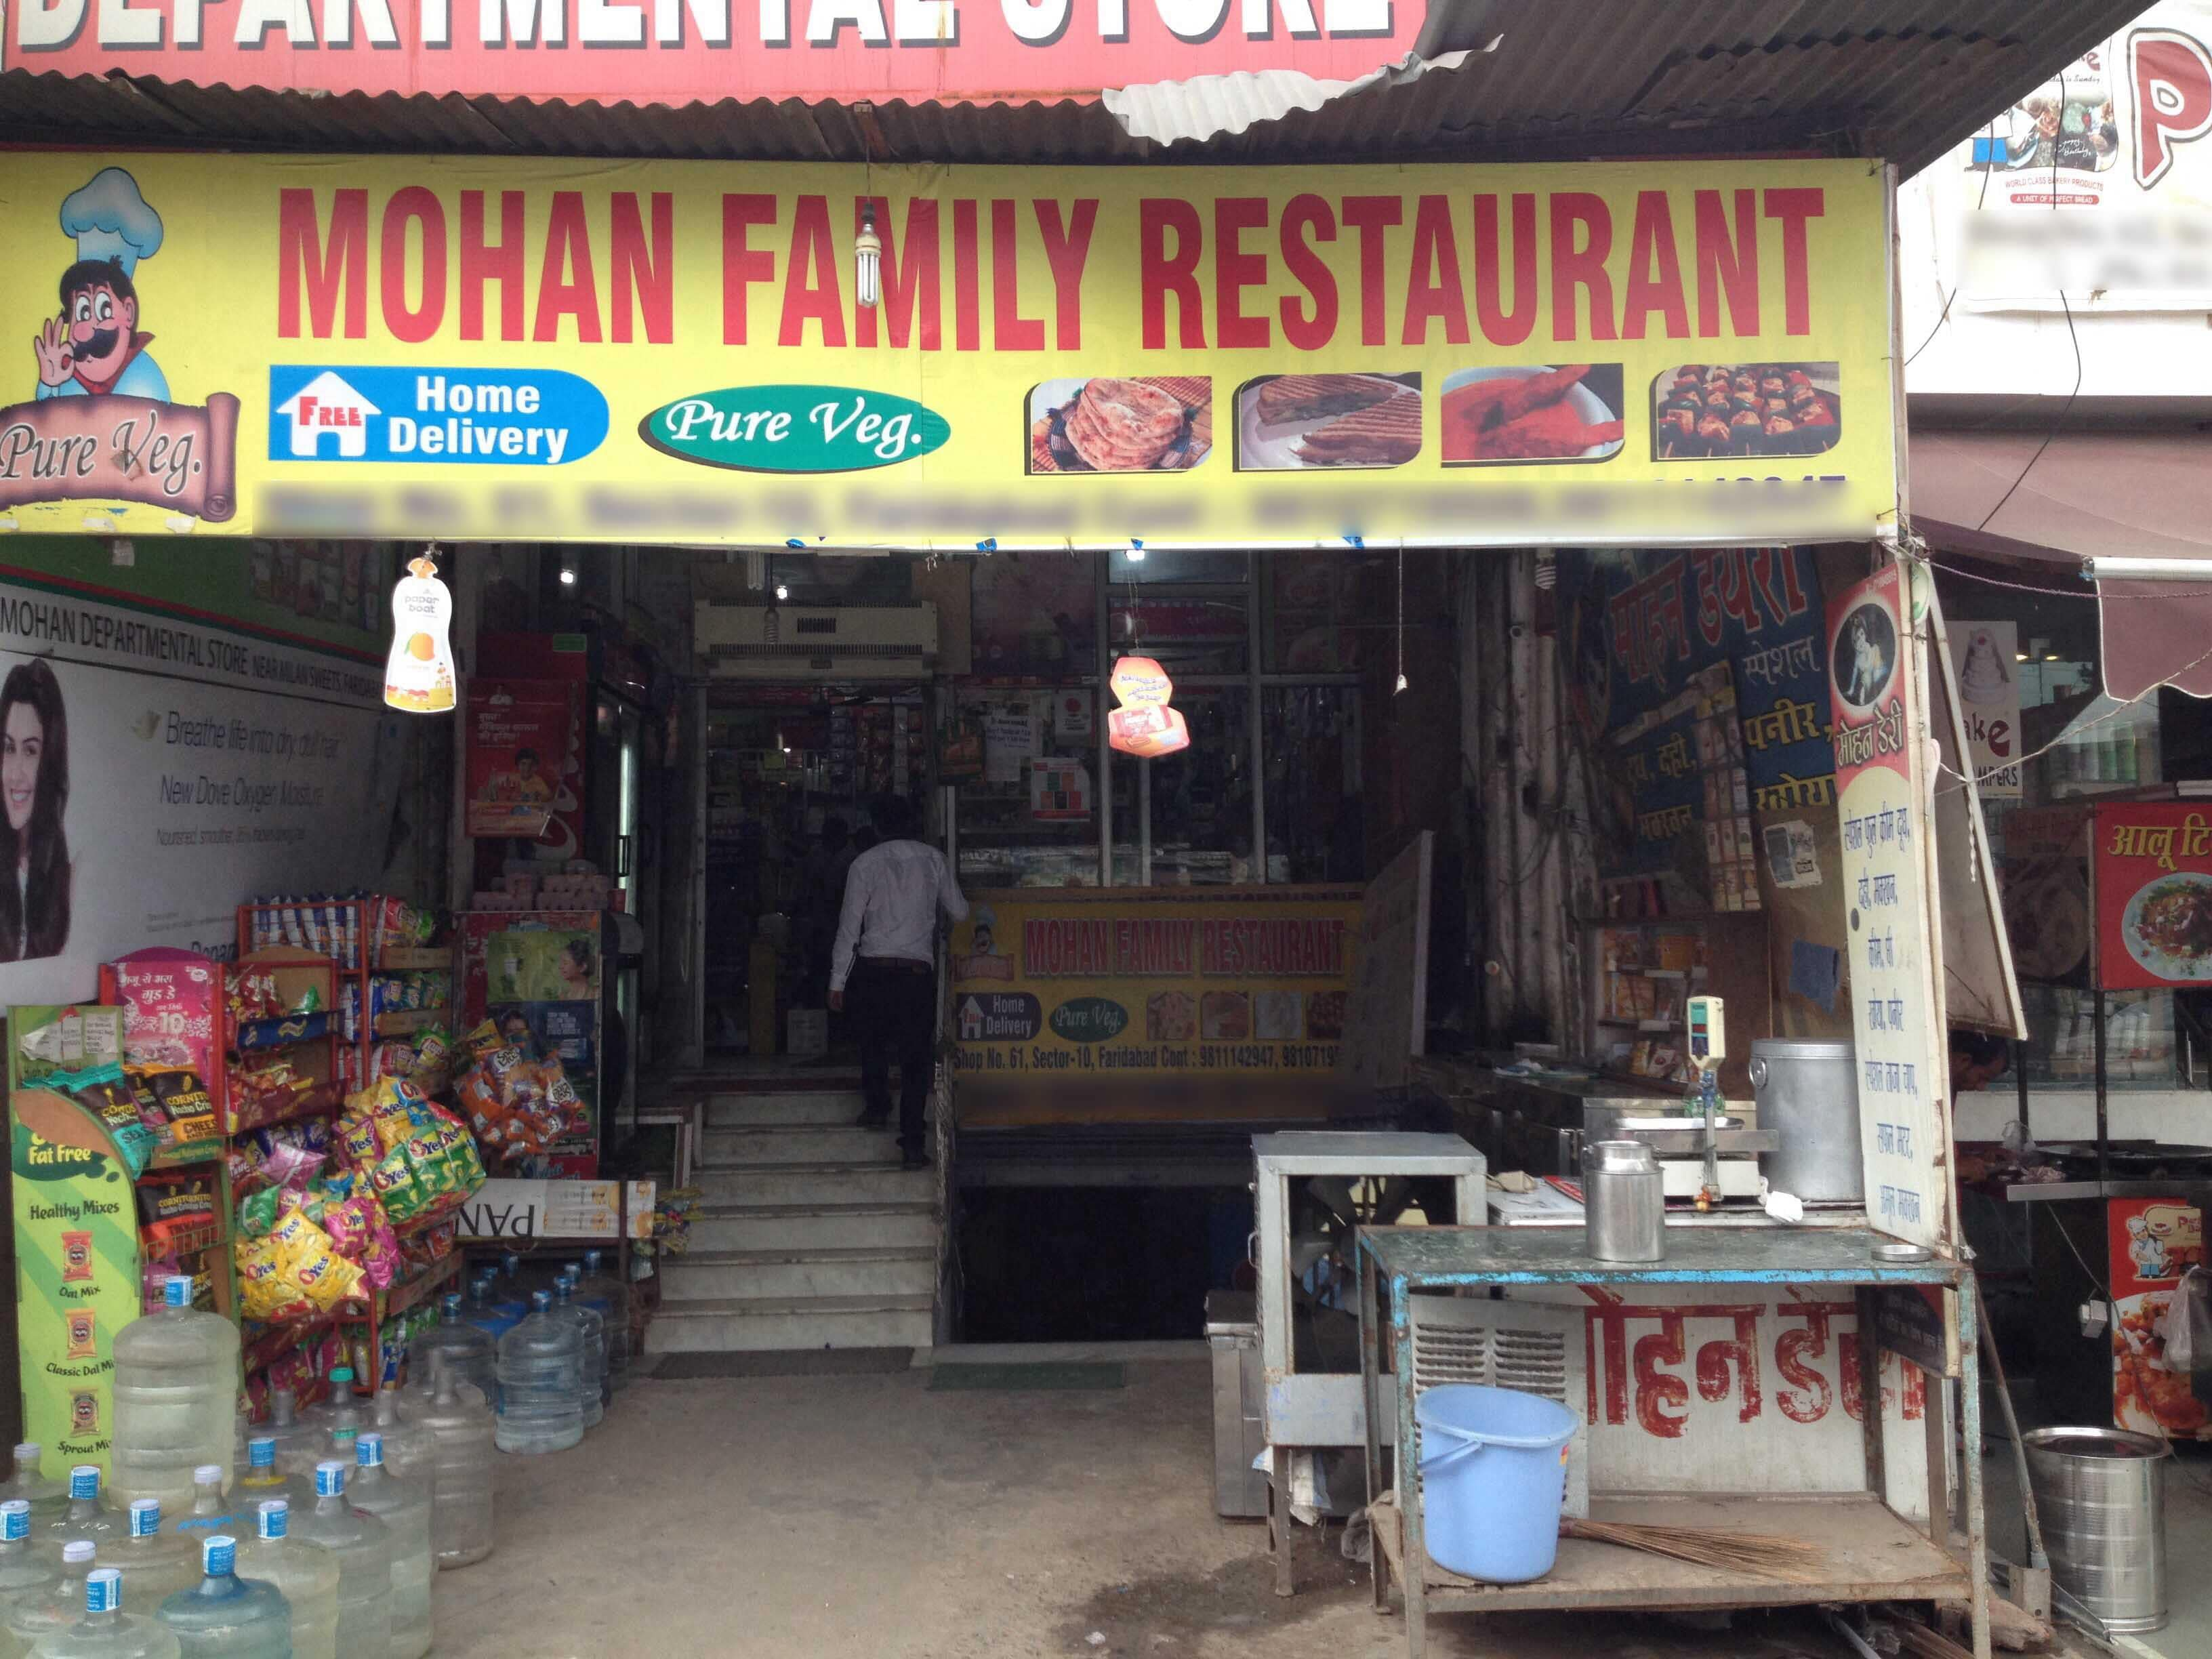 Mohan Family Restaurant - Sector 10 - Faridabad Image